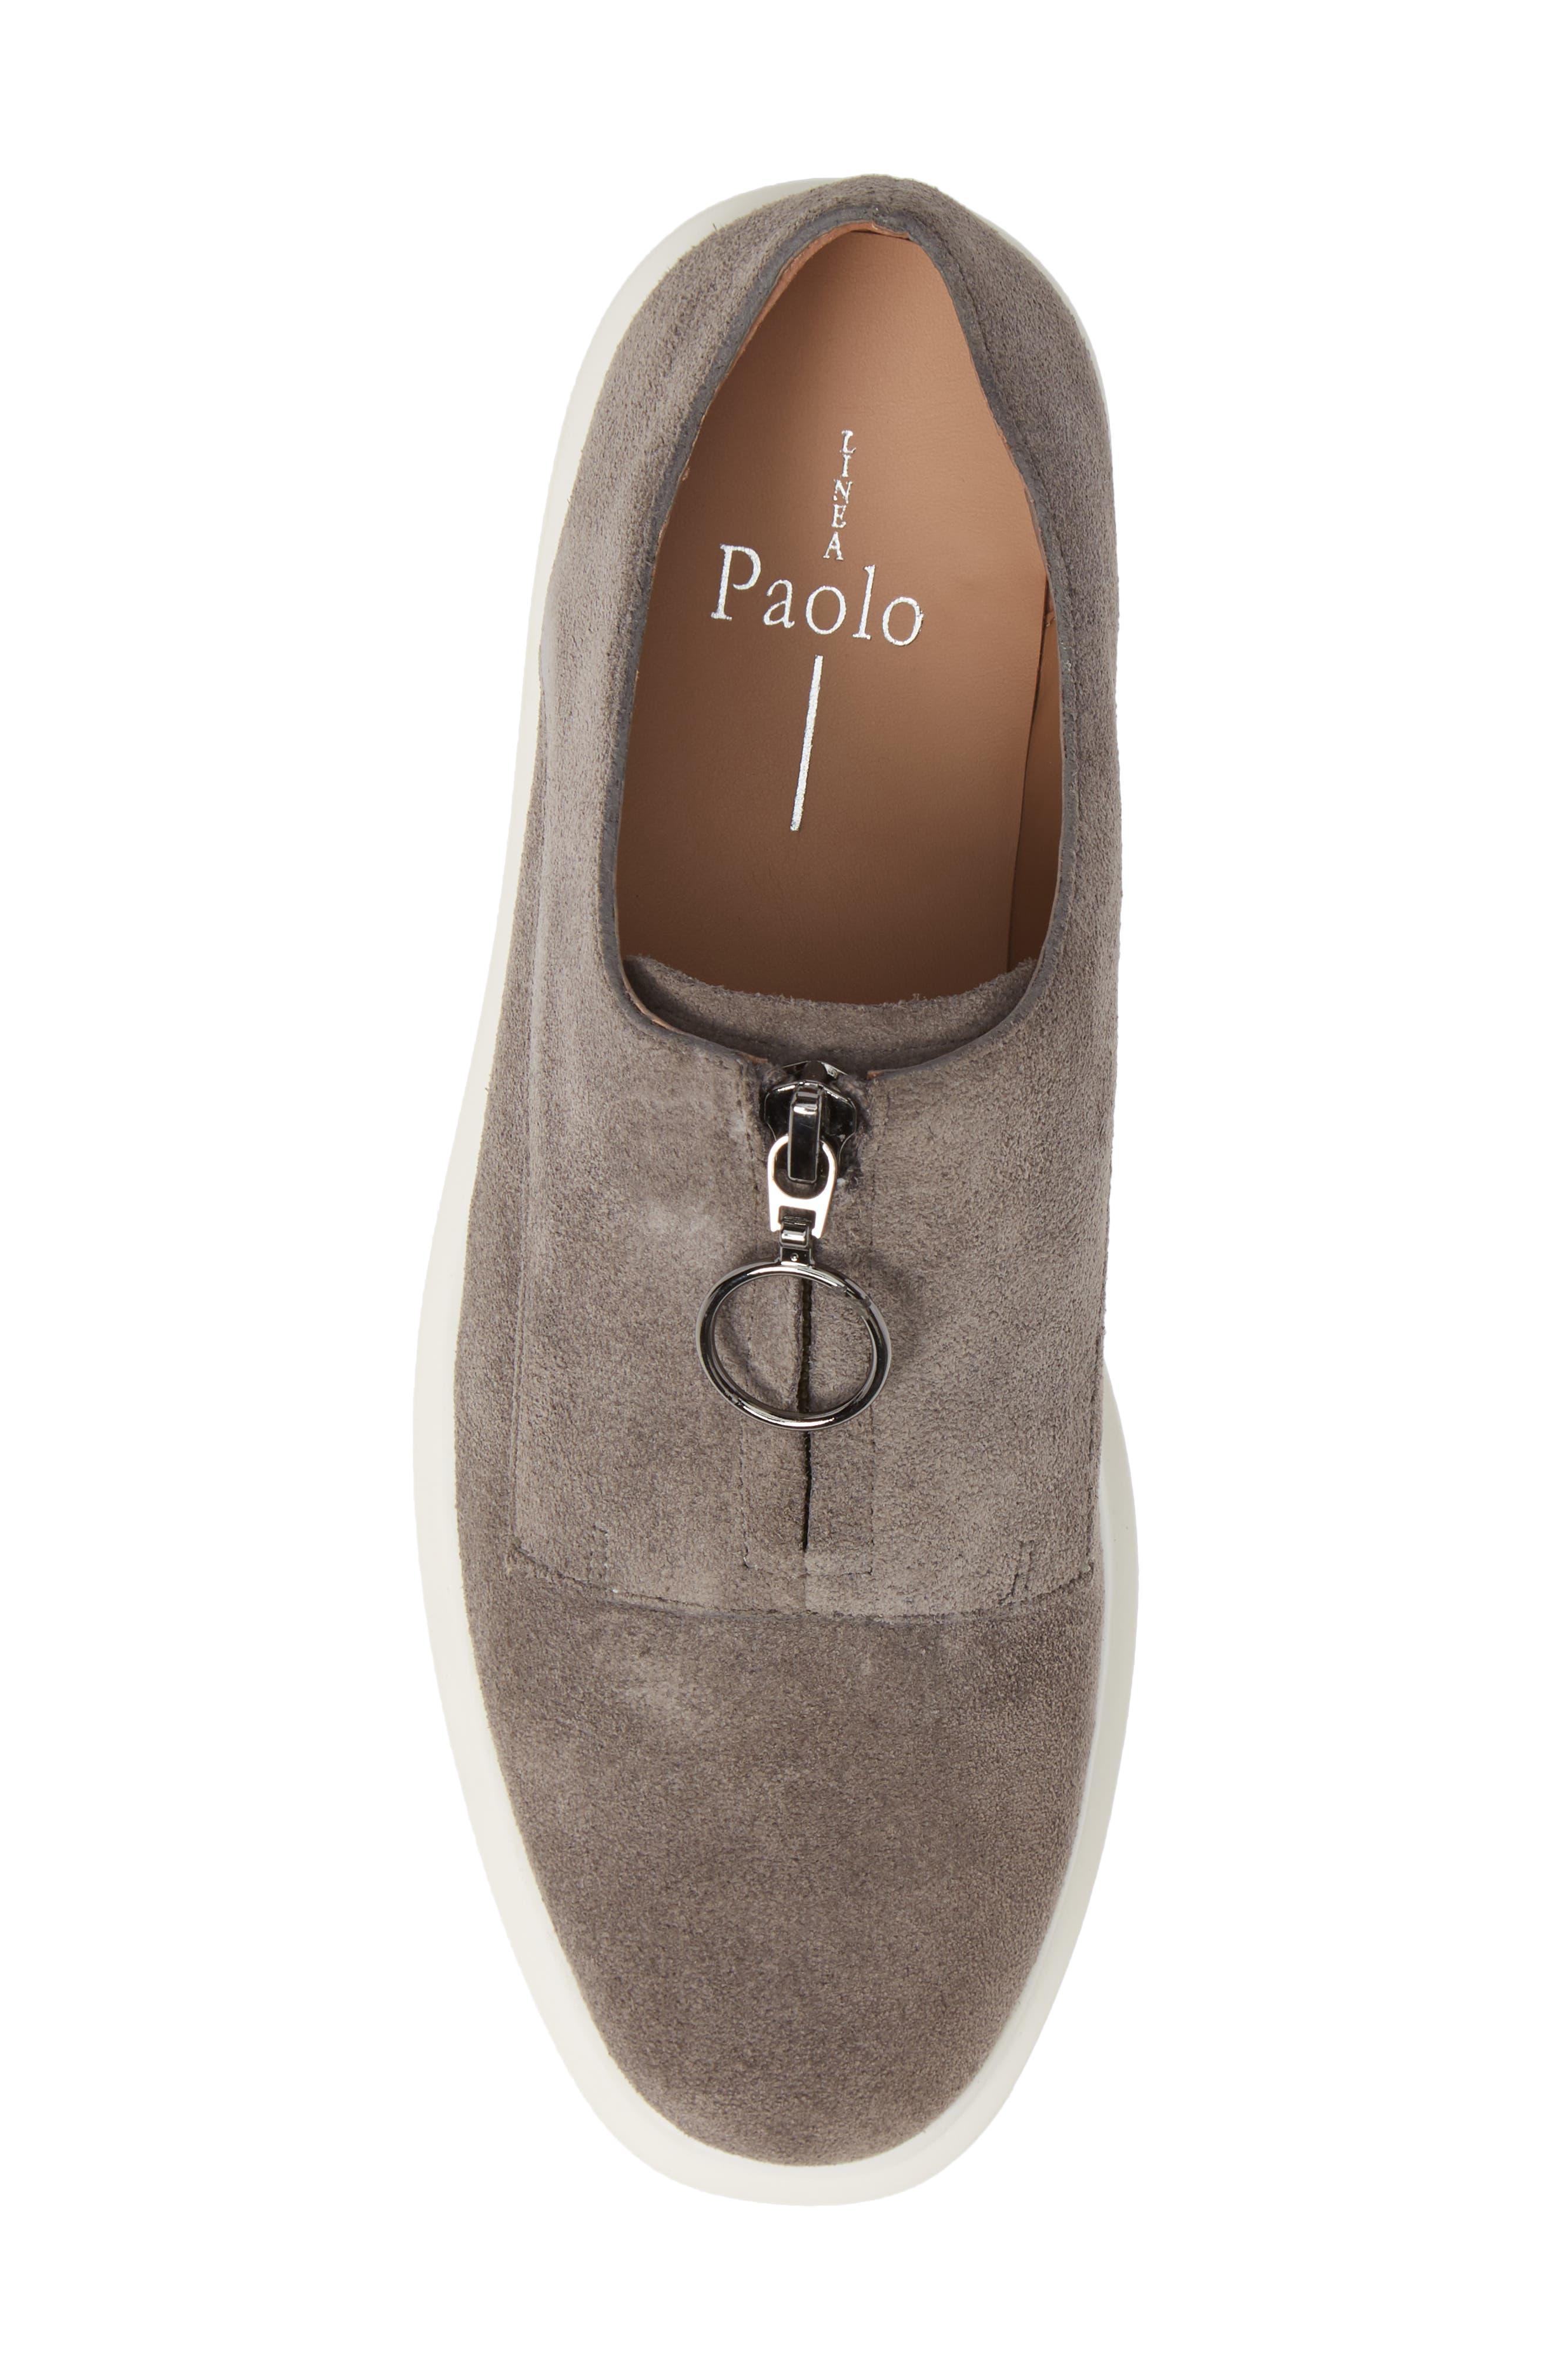 LINEA PAOLO, Kelani Platform Sneaker, Alternate thumbnail 5, color, STONE SUEDE